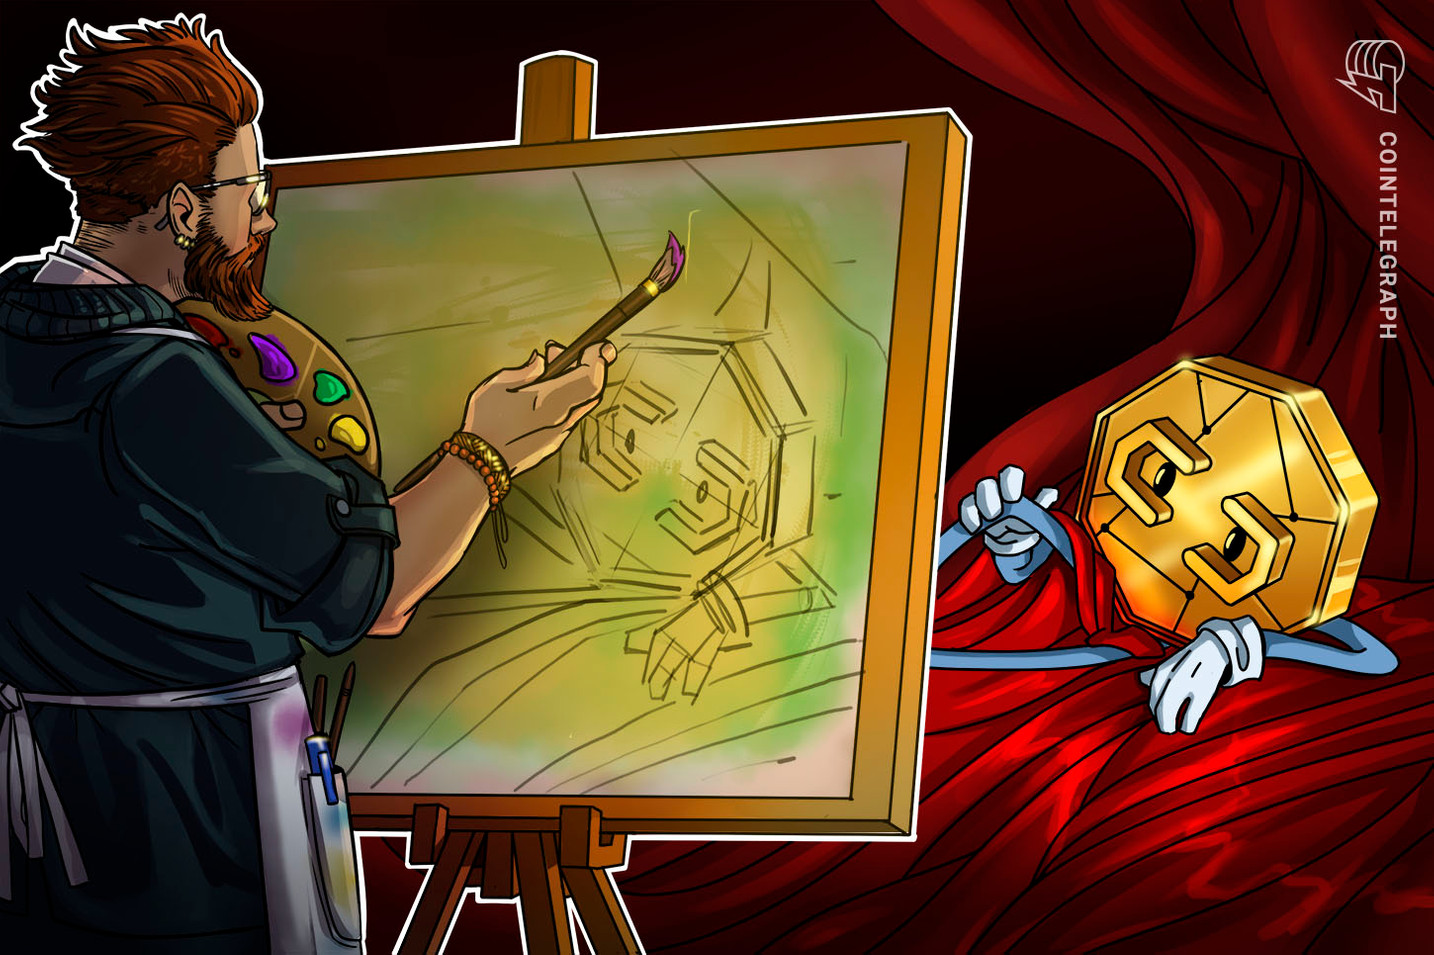 Former DC comic book artist fetches $1.85M auctioning Wonder Woman NFTs